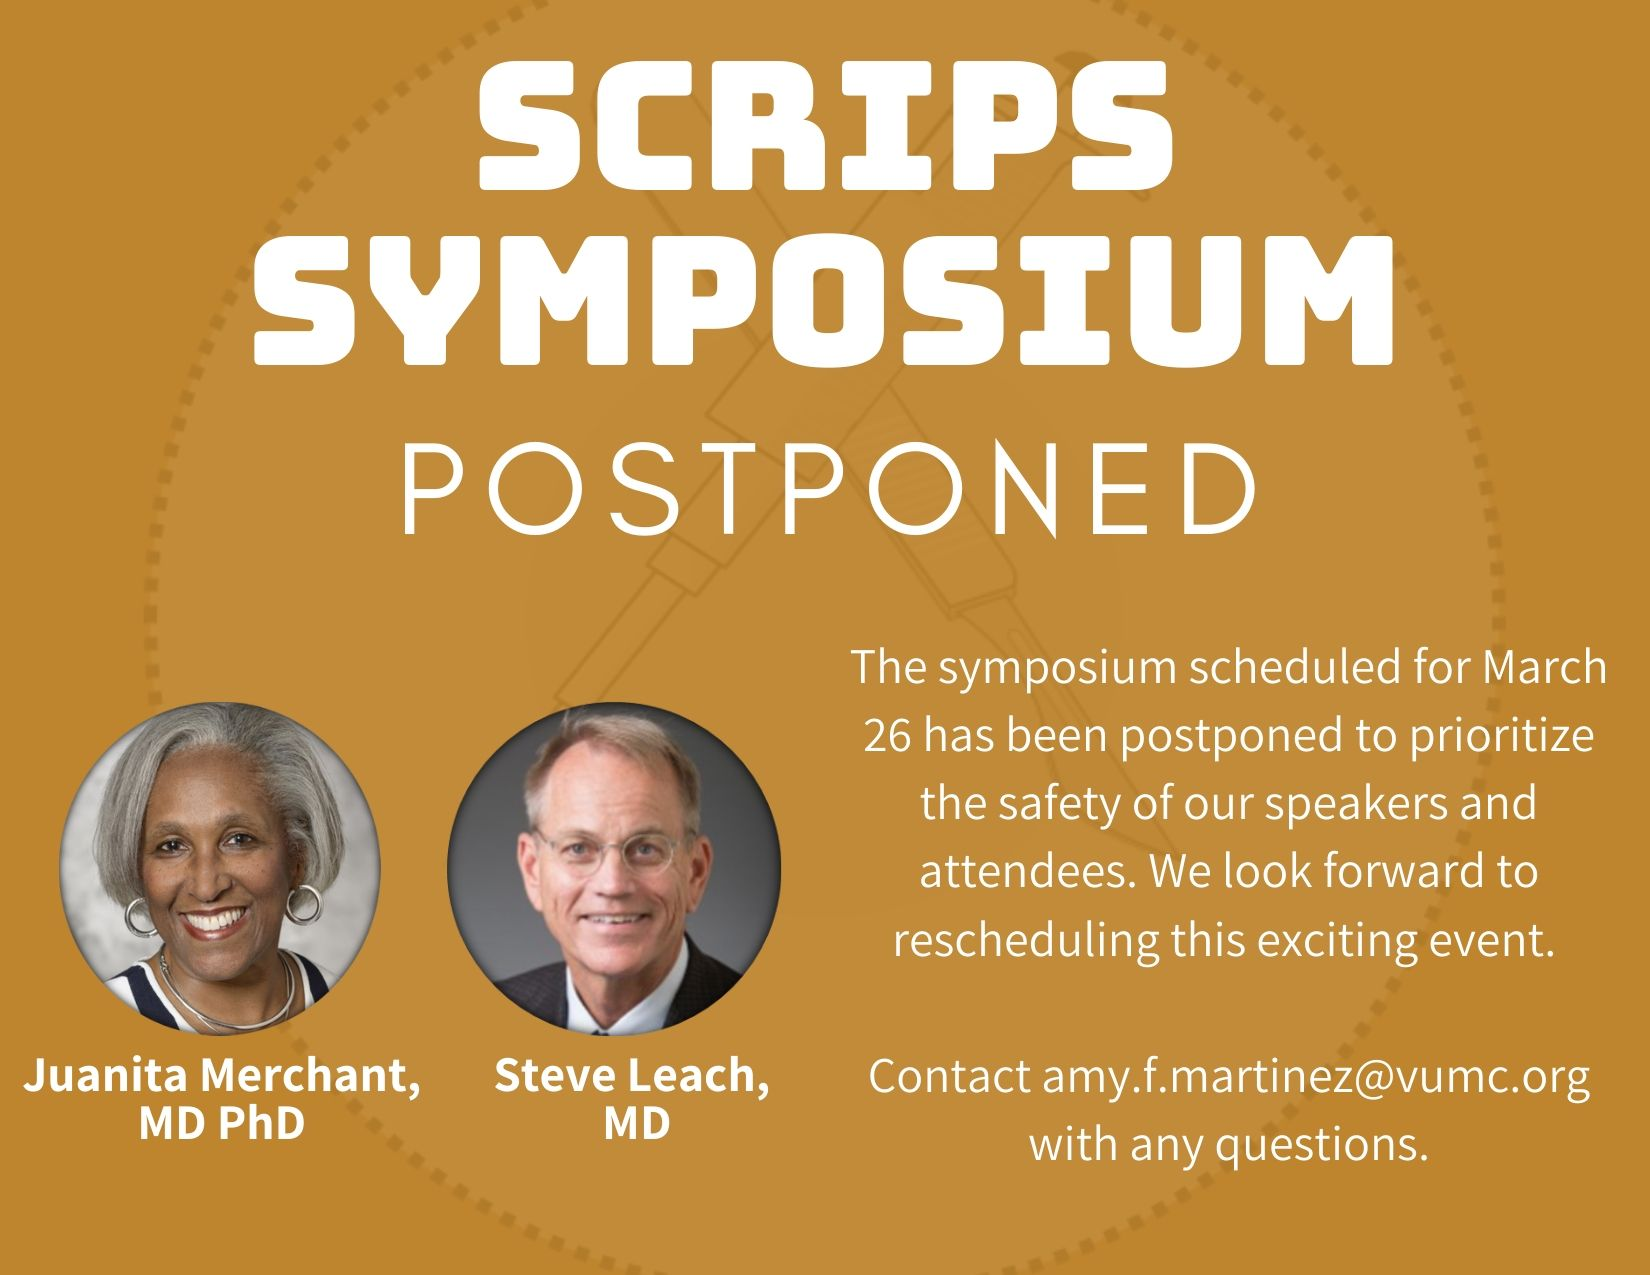 SCRIPS postponed